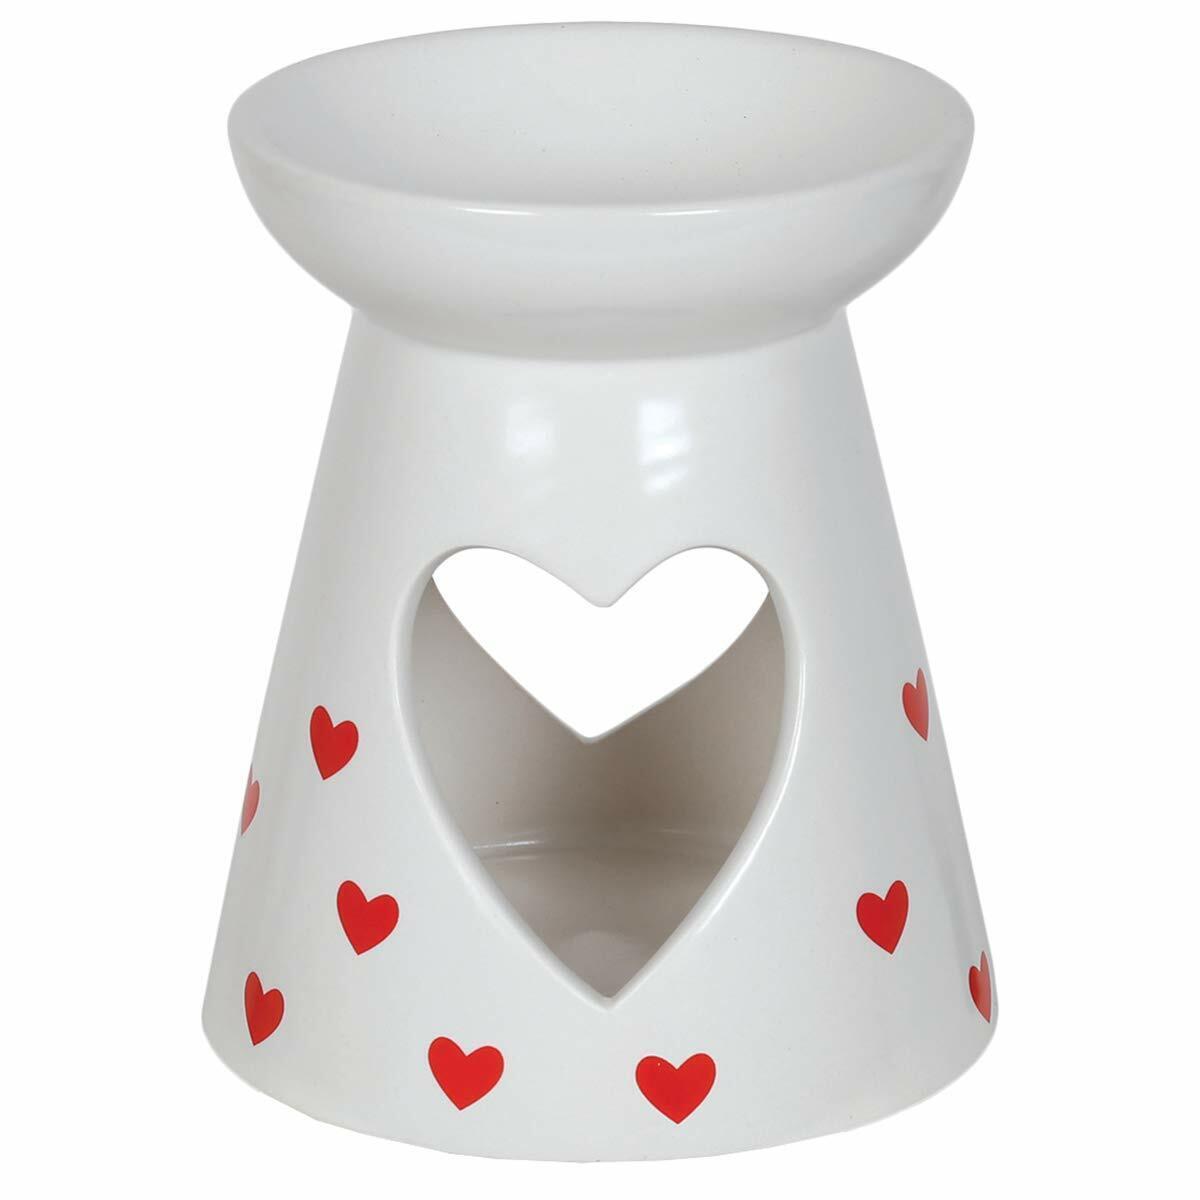 Aroma Accessories Red Hearts Pattern Ceramic Wax Melt Burner 13cm high